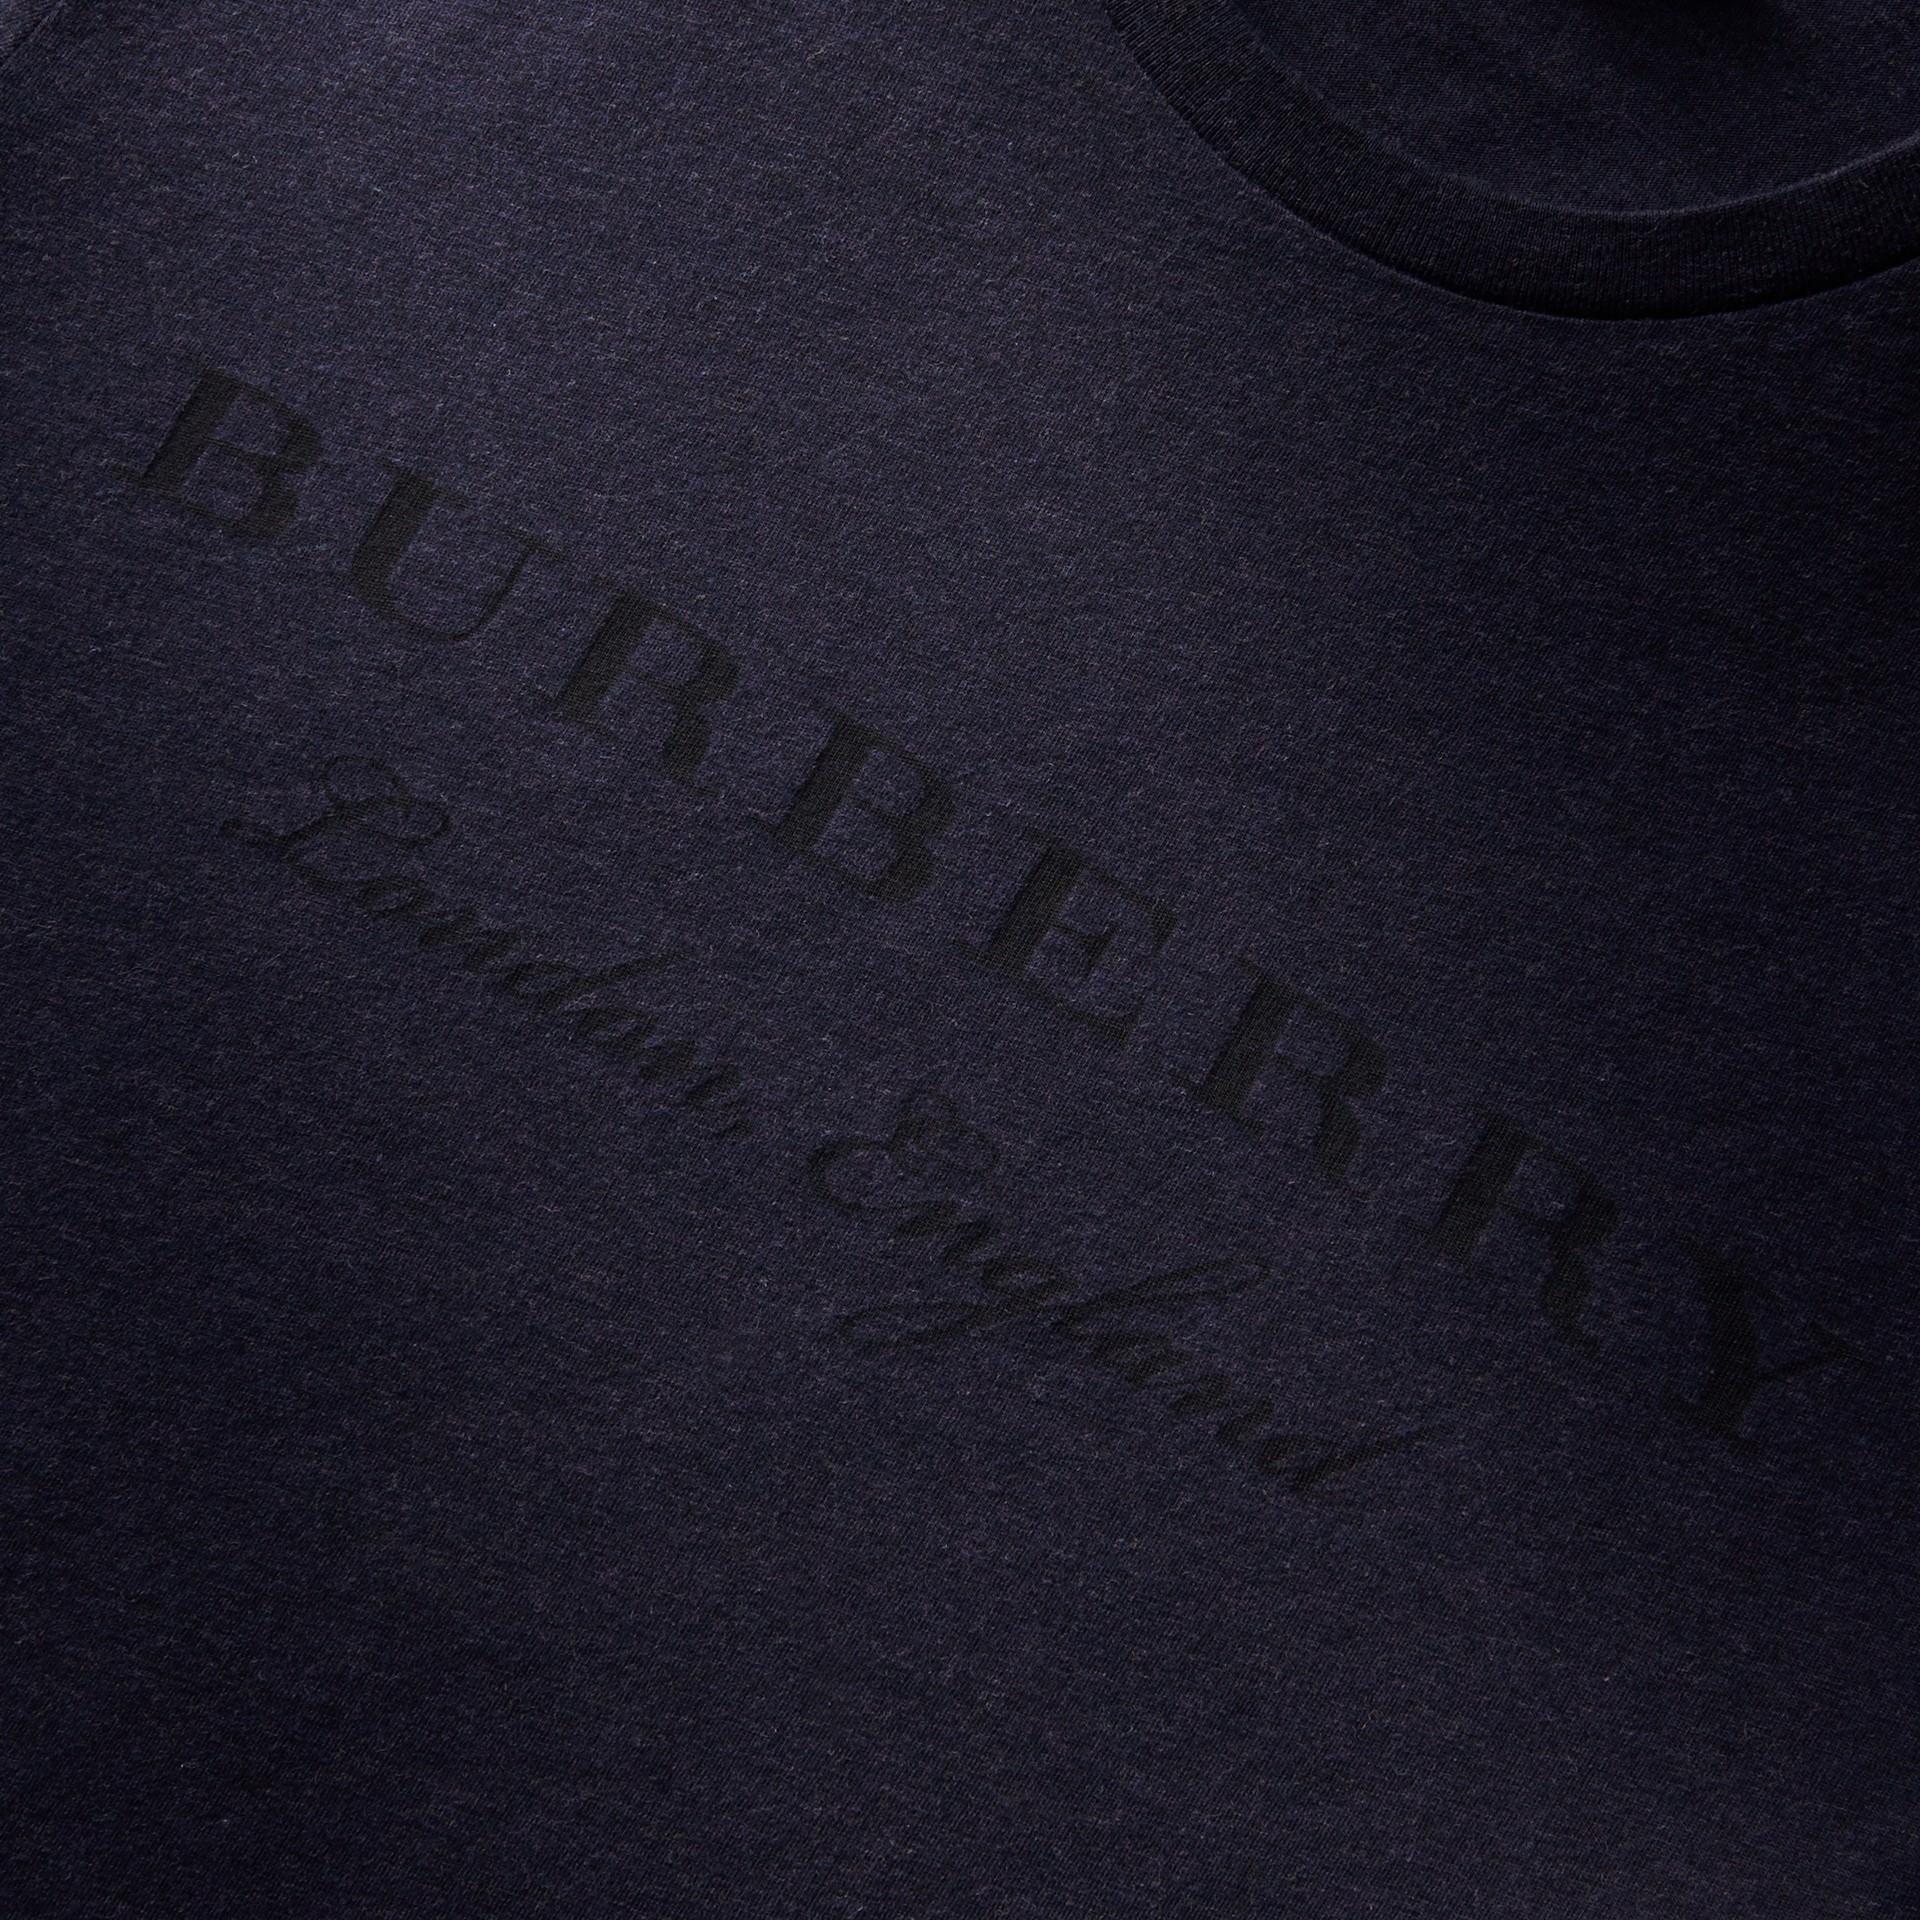 Contrast Motif Cotton Blend T-shirt Navy Melange - gallery image 2